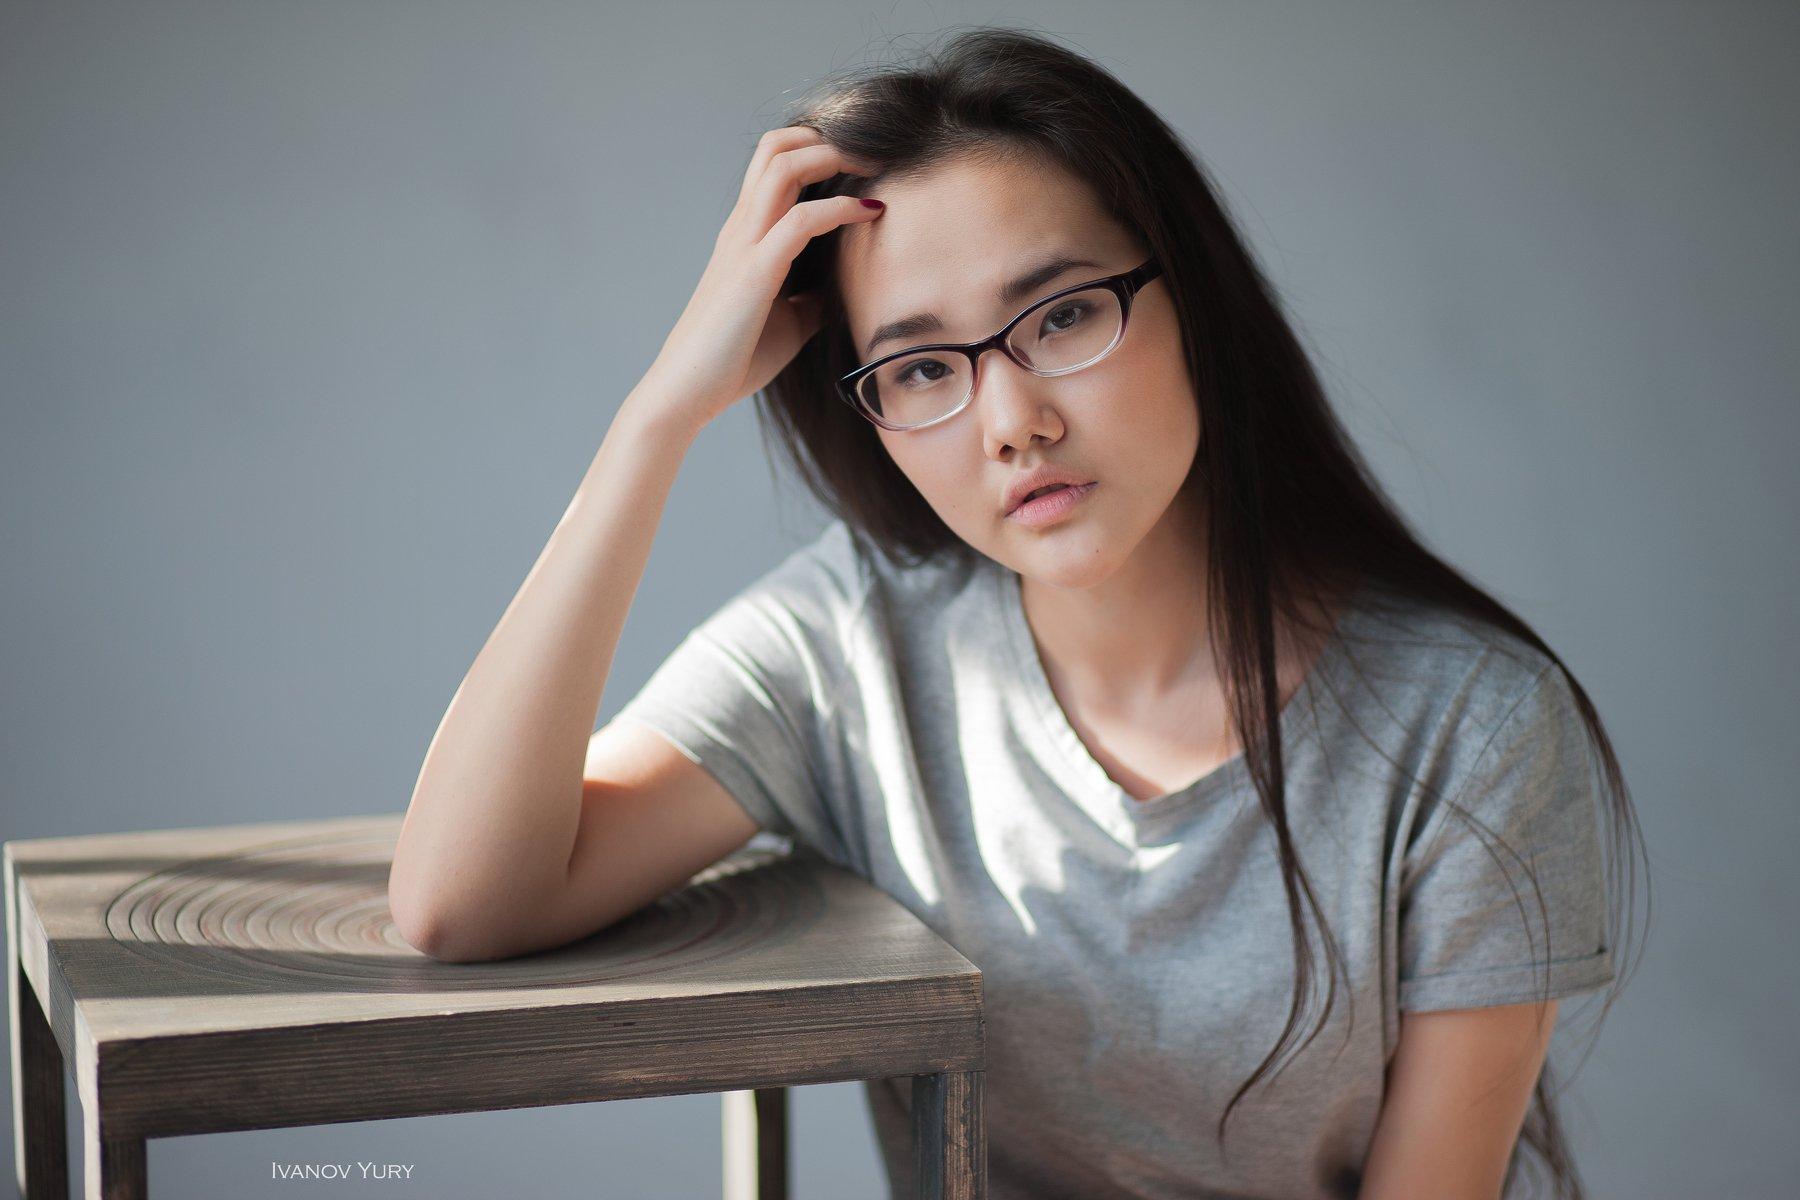 девушка, студия, свет, стул, азиатка, очки, красавица, милая девушка, студия, Иванов Юрий